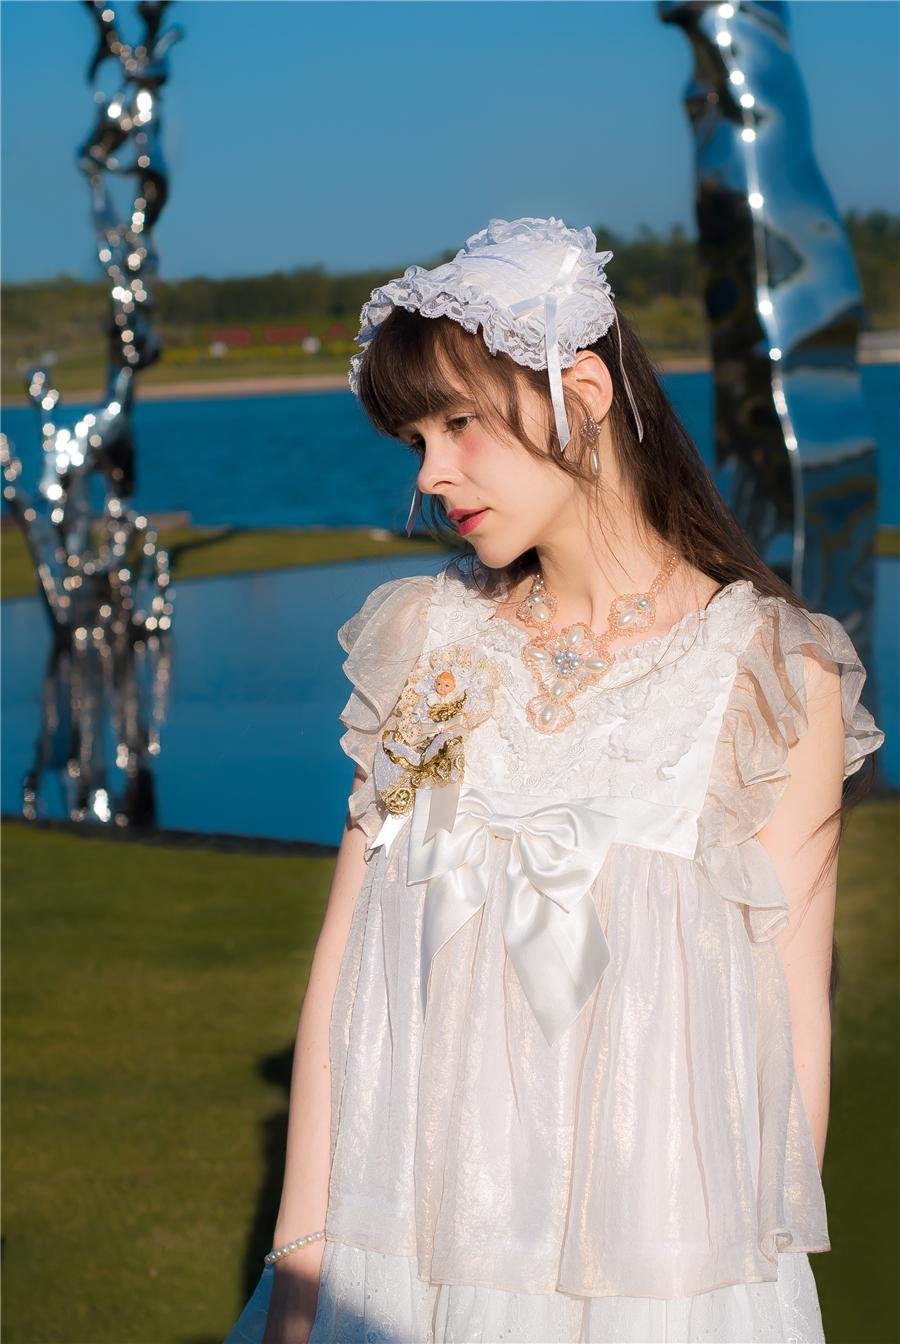 BabyPonytail_modelclaudia_Present Angel White JSK park01.jpg